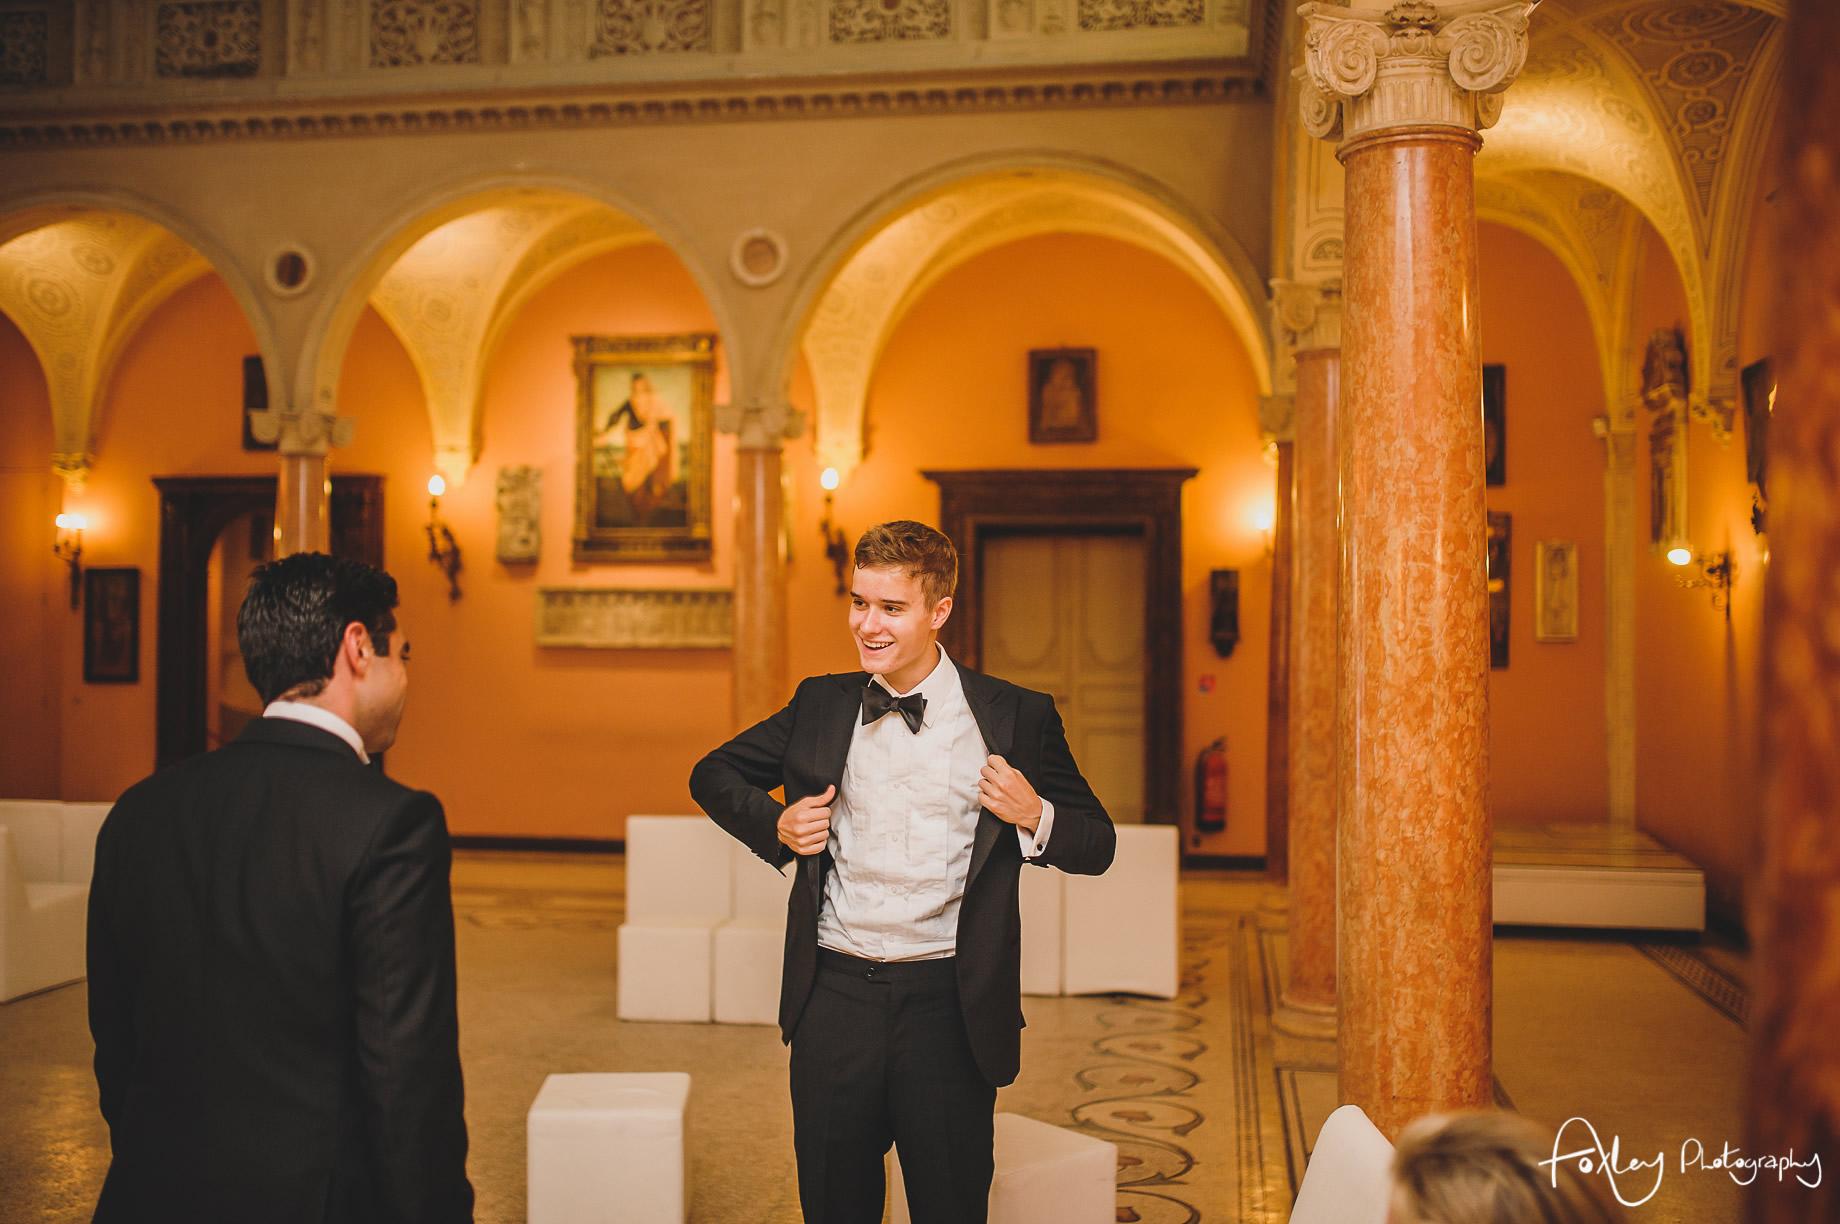 Jil and Will's Wedding at Villa Ephrussi De Rothschild 063